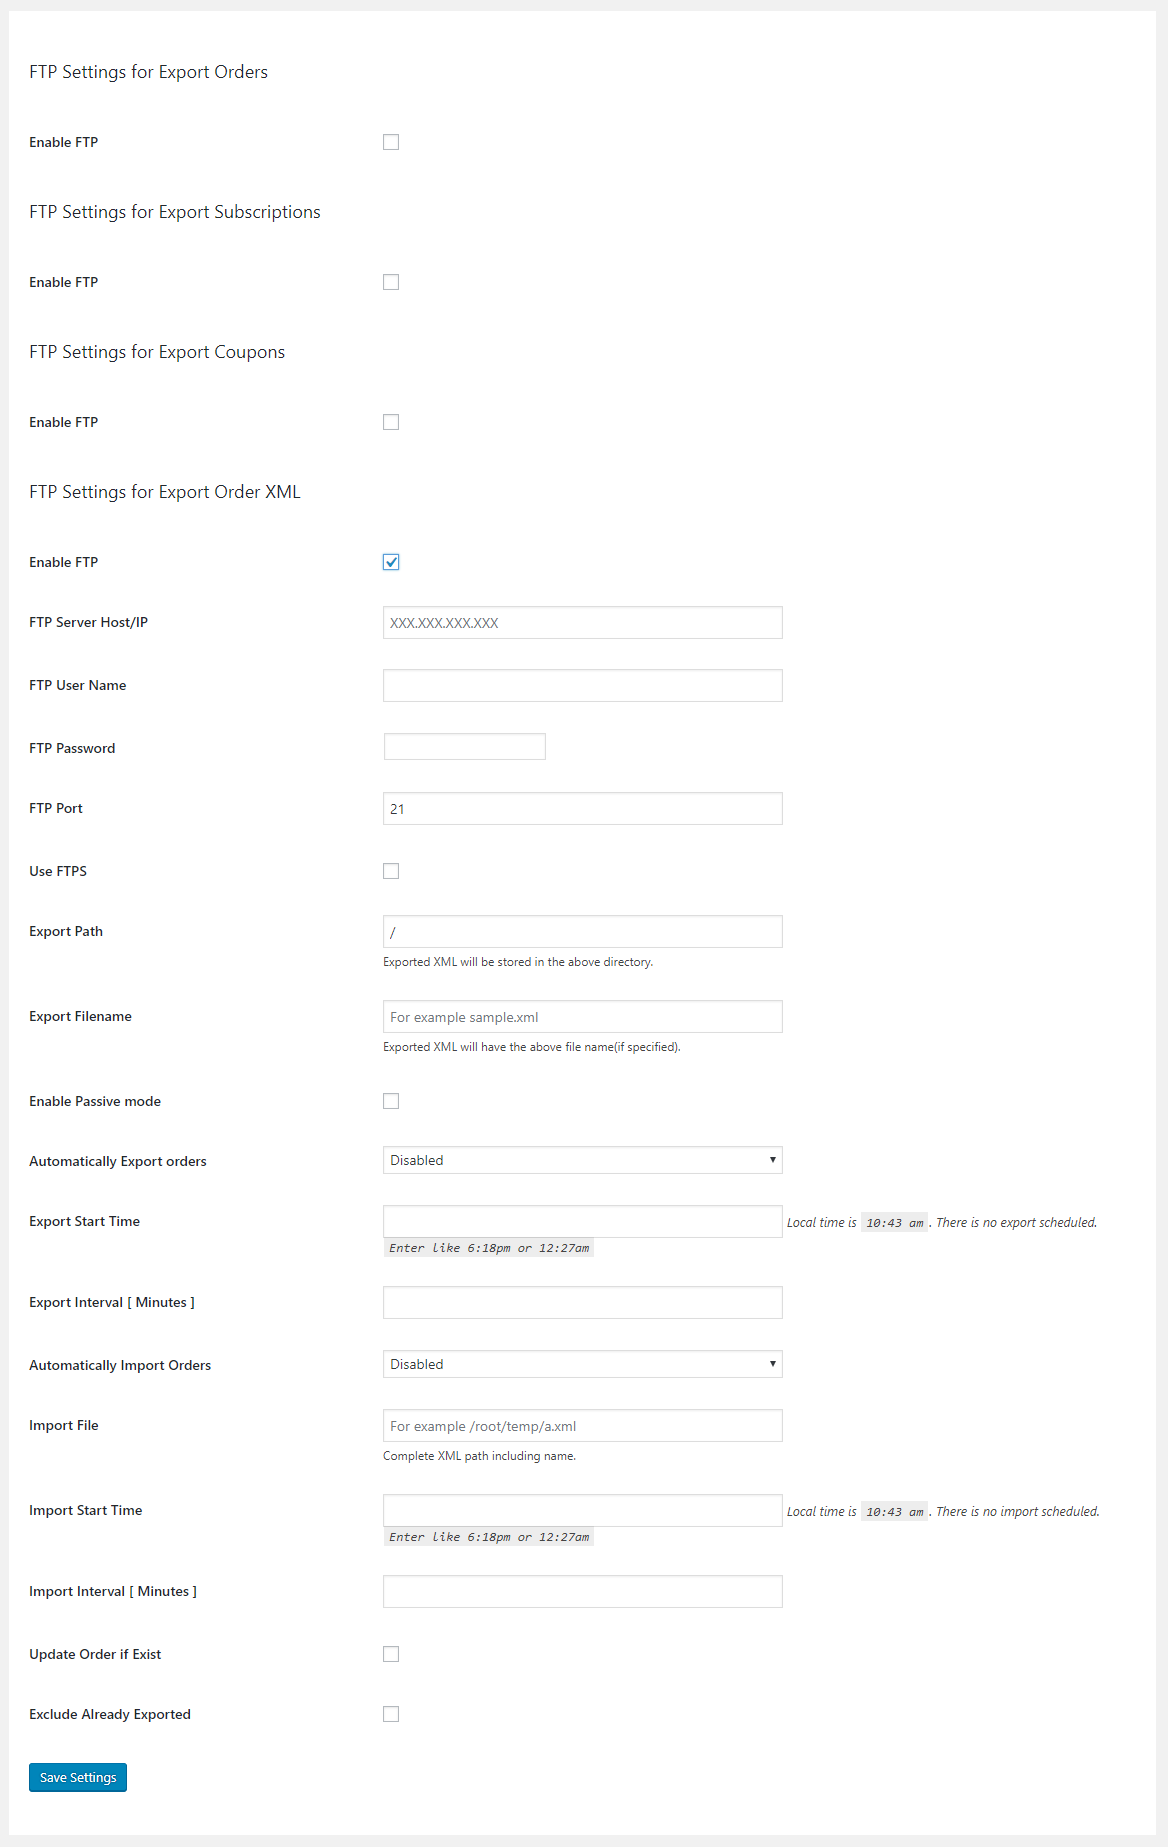 Order XML settings tab